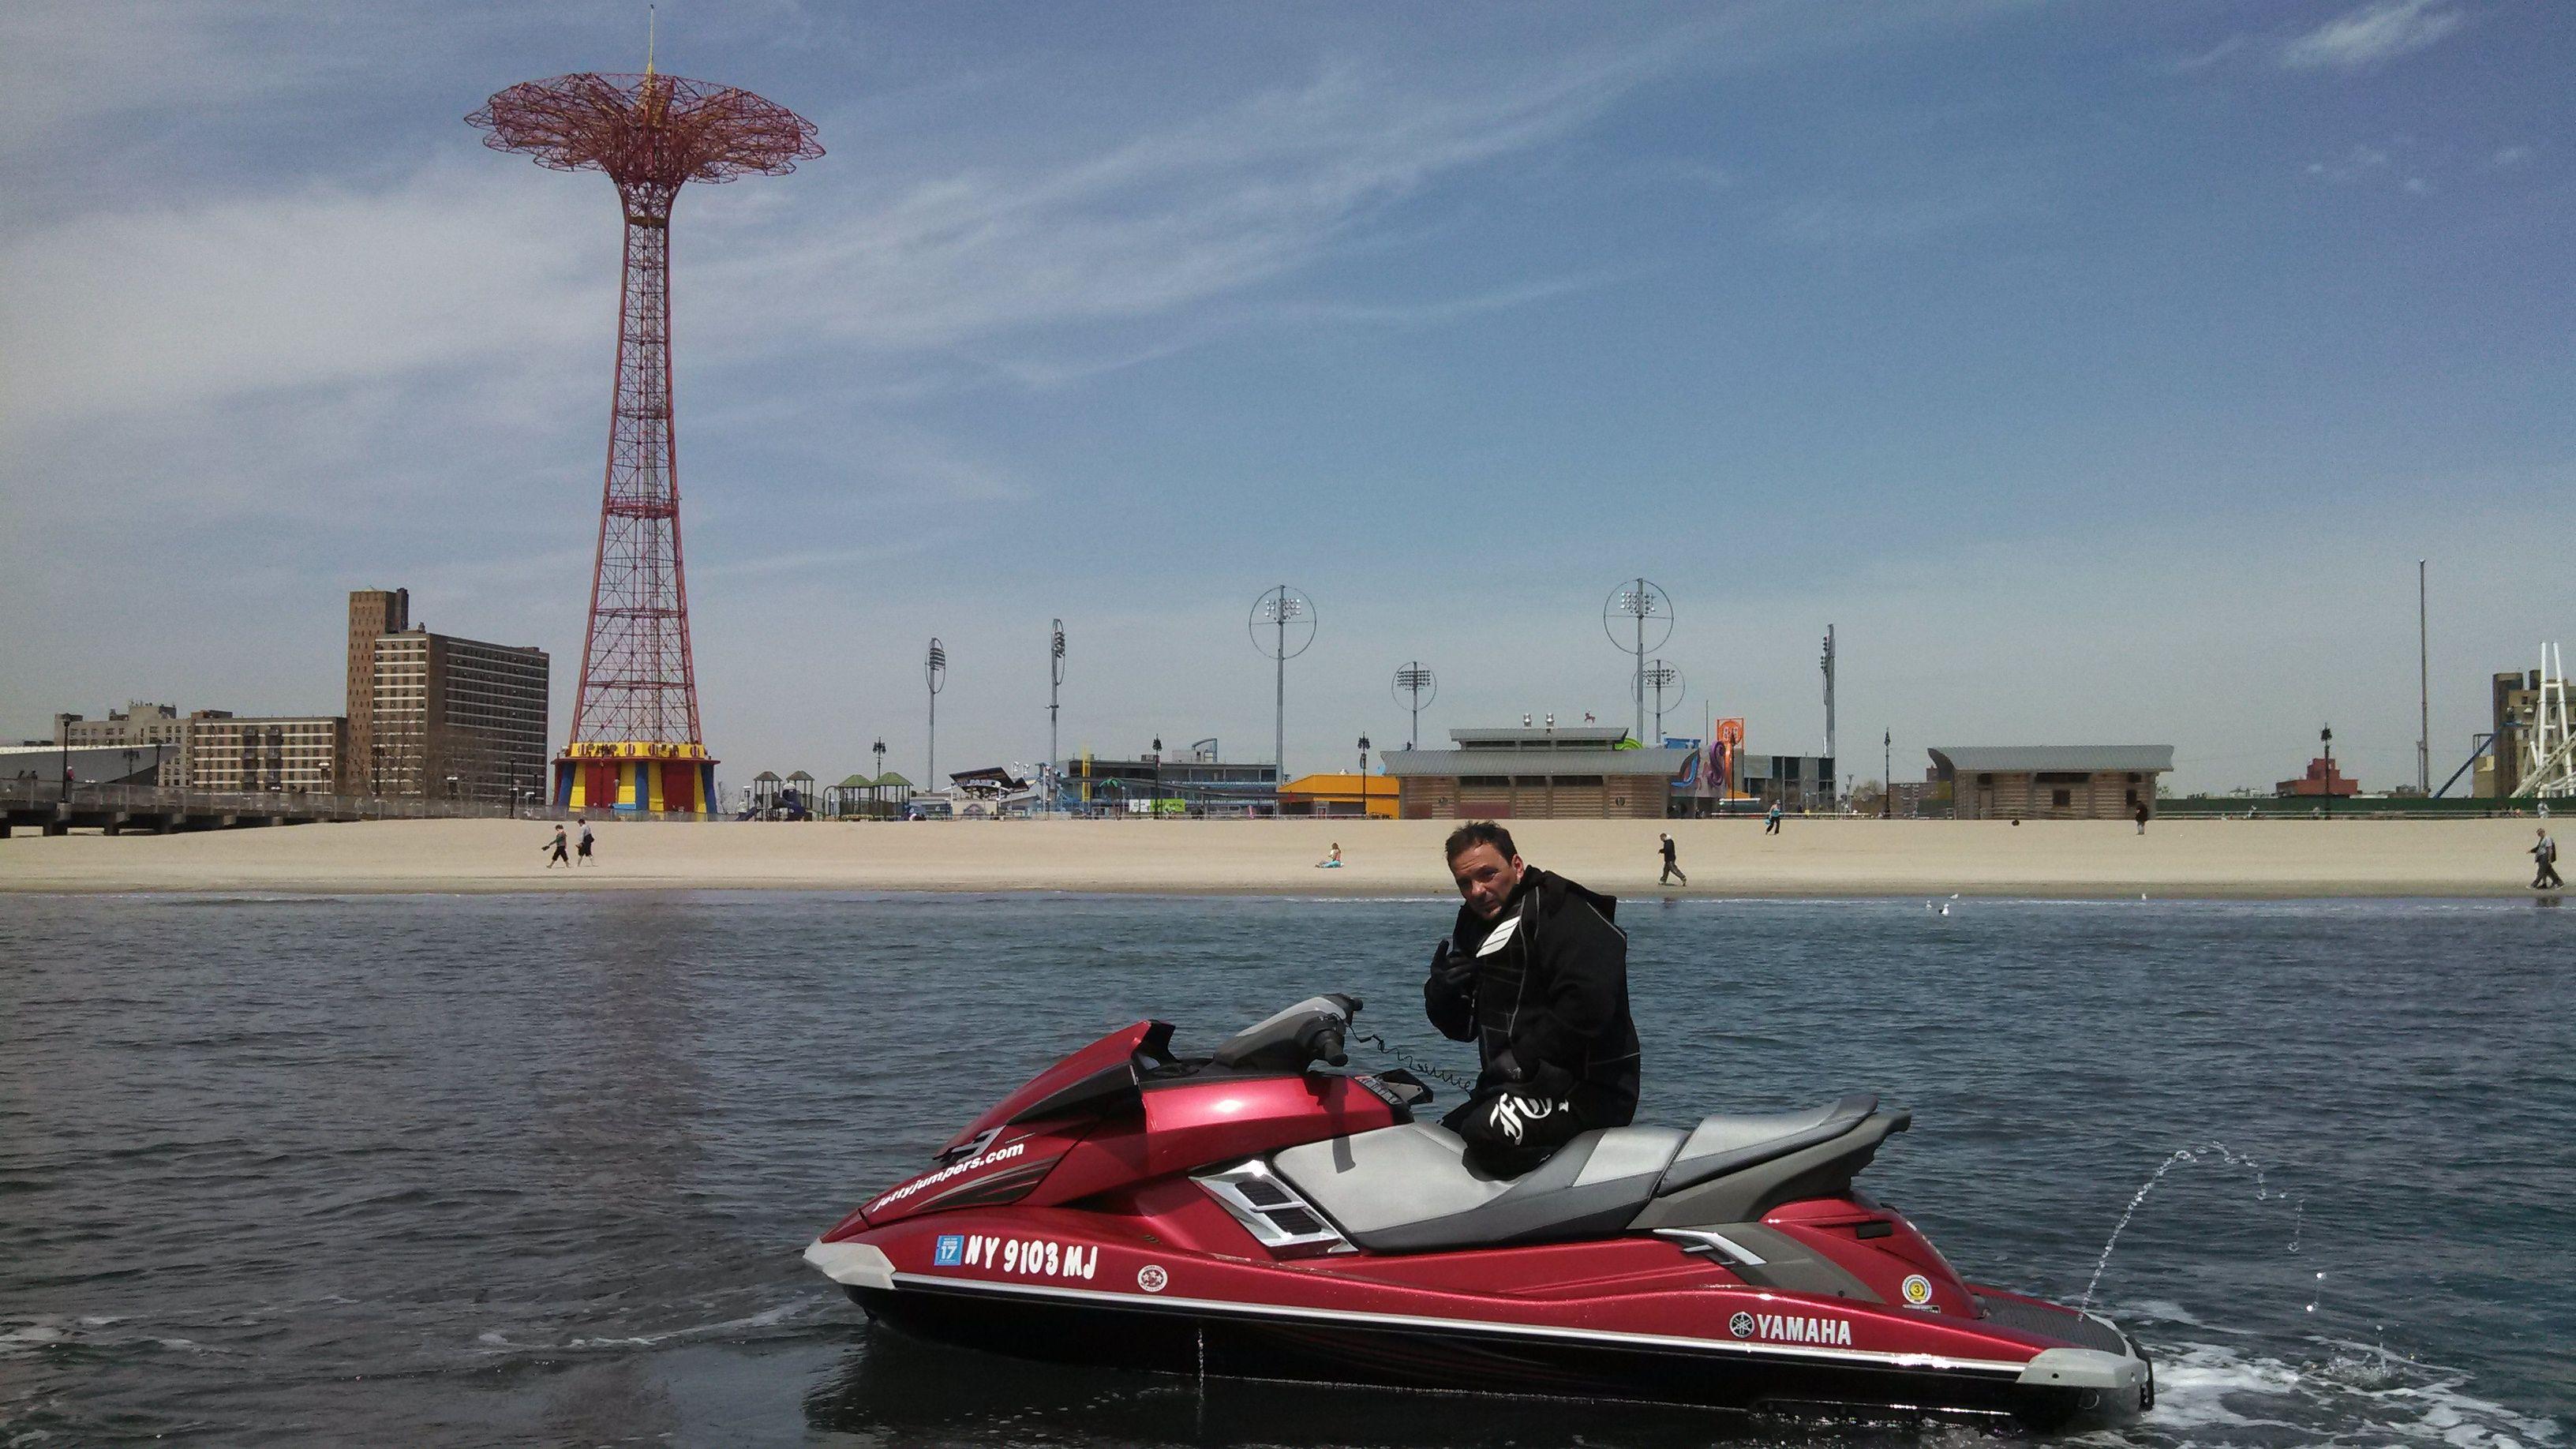 Jet ski tours to coney island and nyc